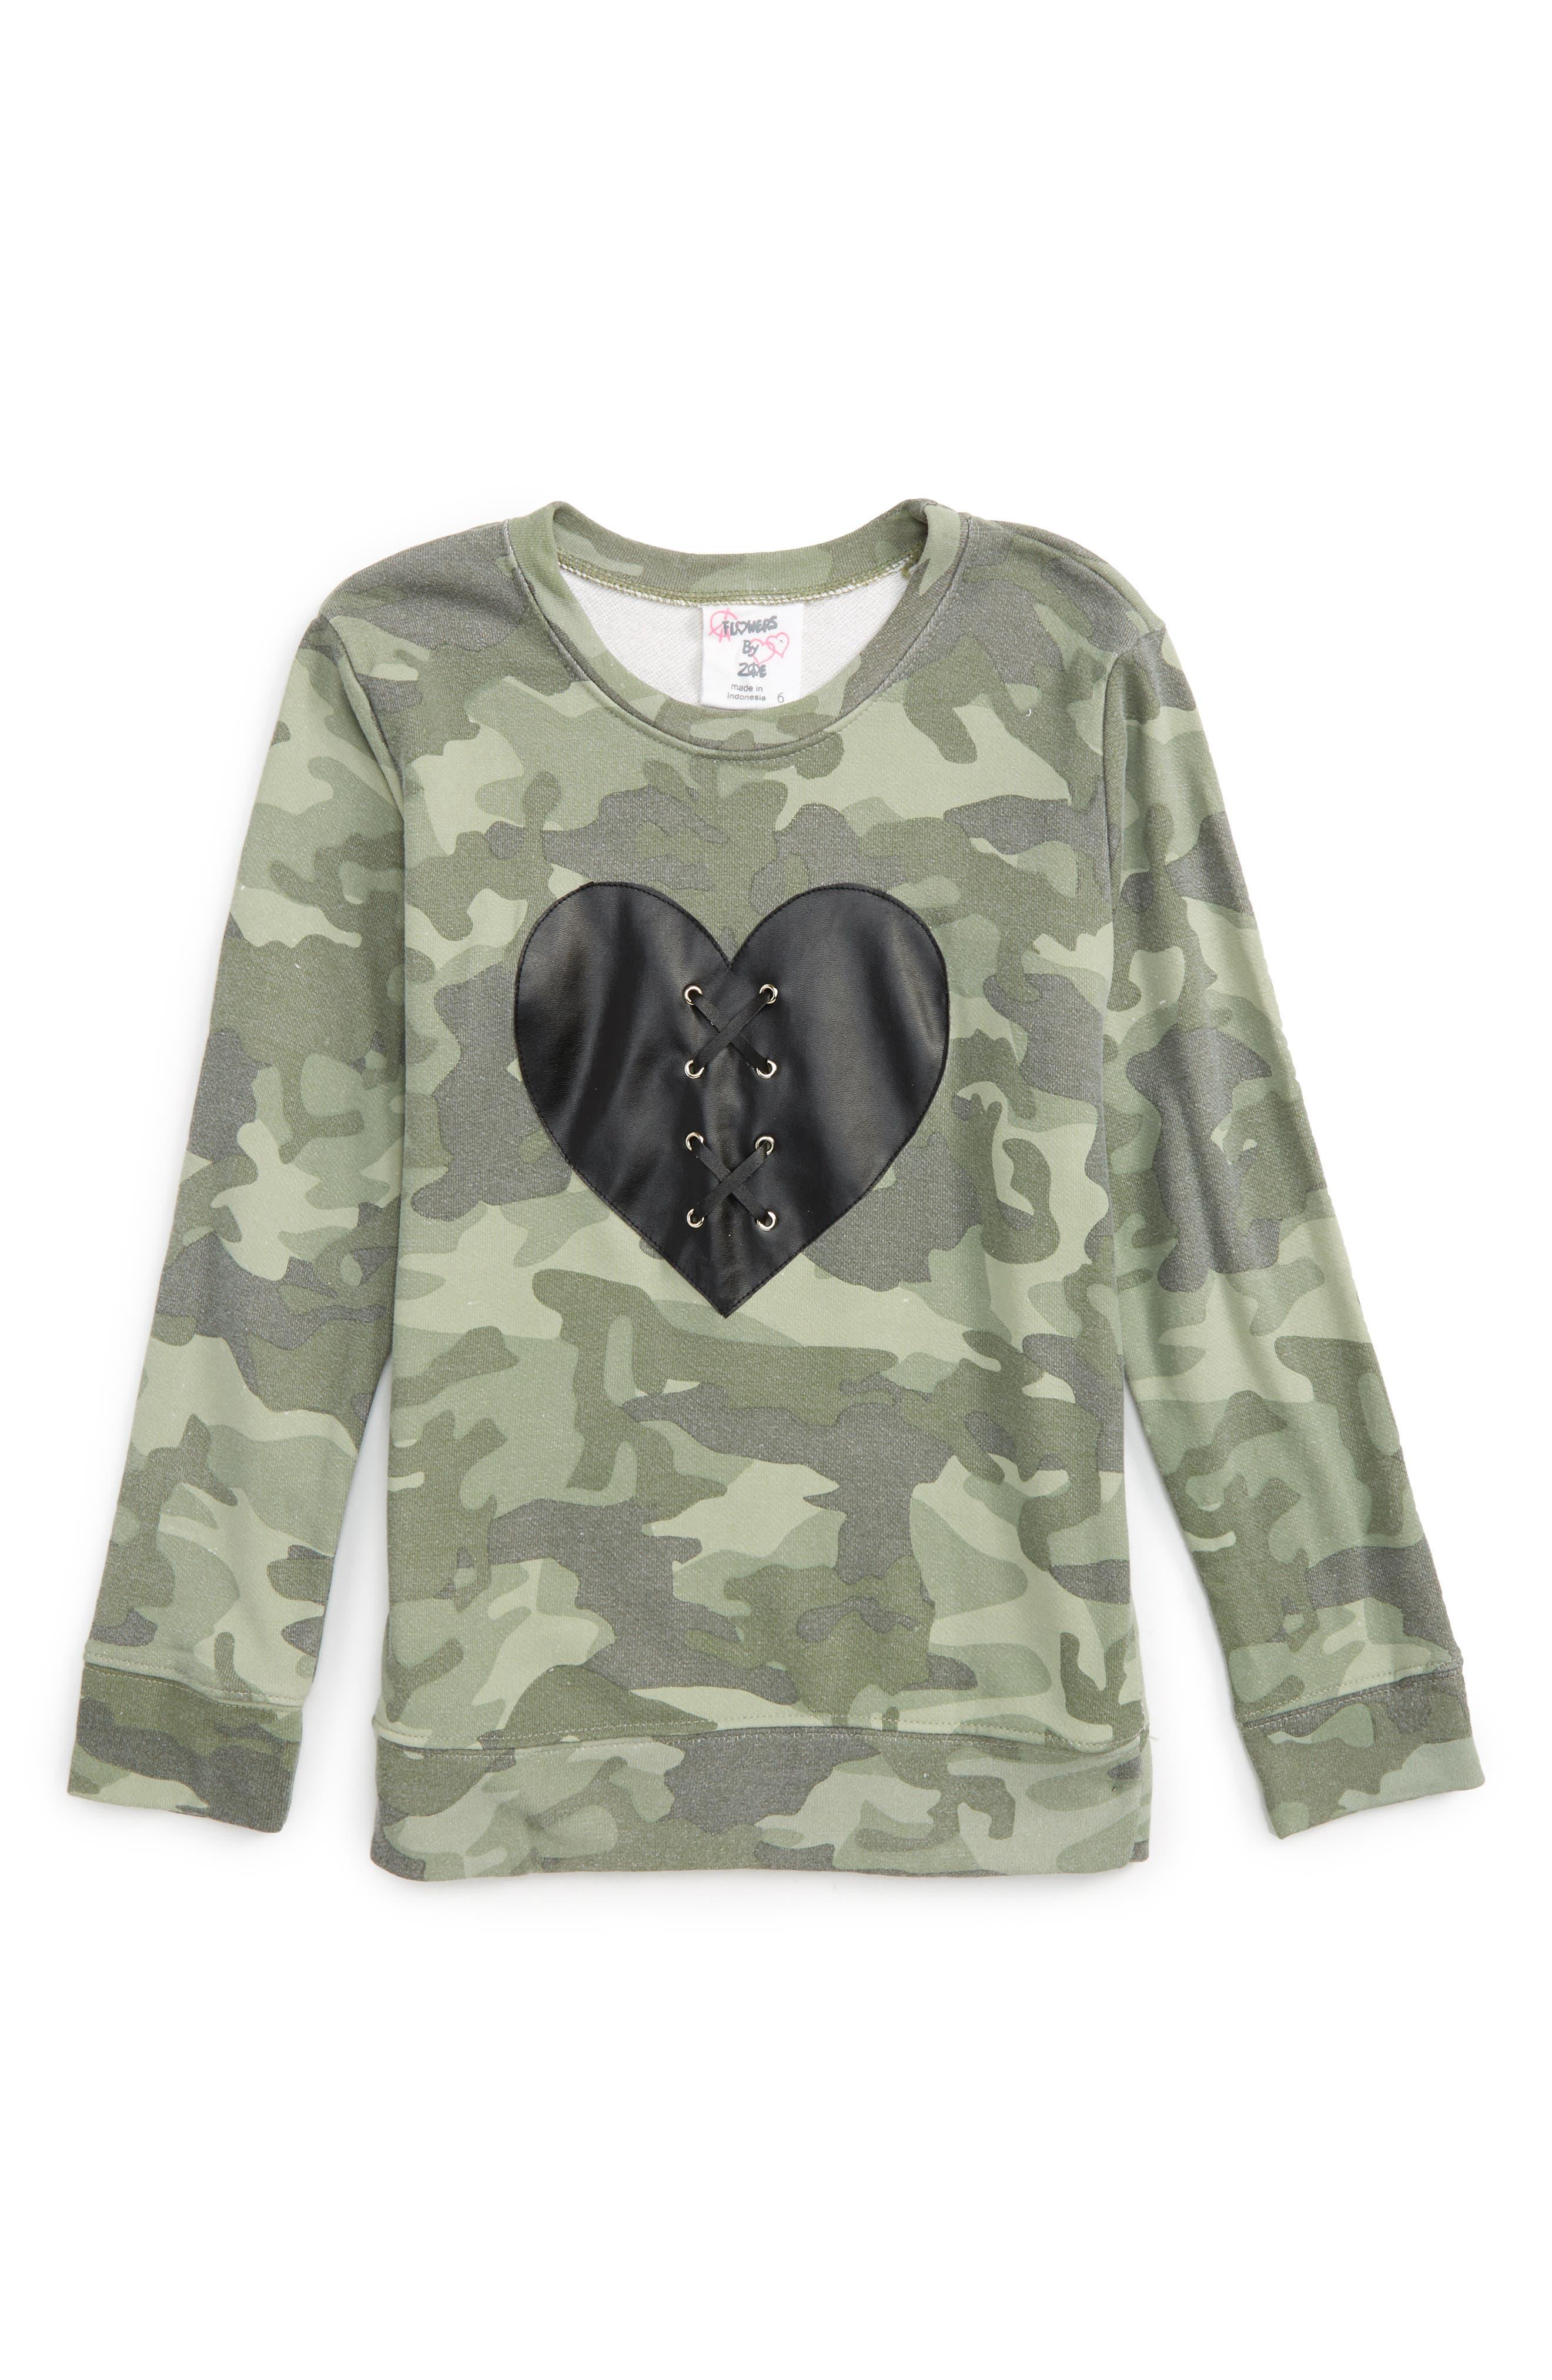 Main Image - Flowers by Zoe Lace-Up Heart Camo Sweatshirt (Little Girls & Big Girls)